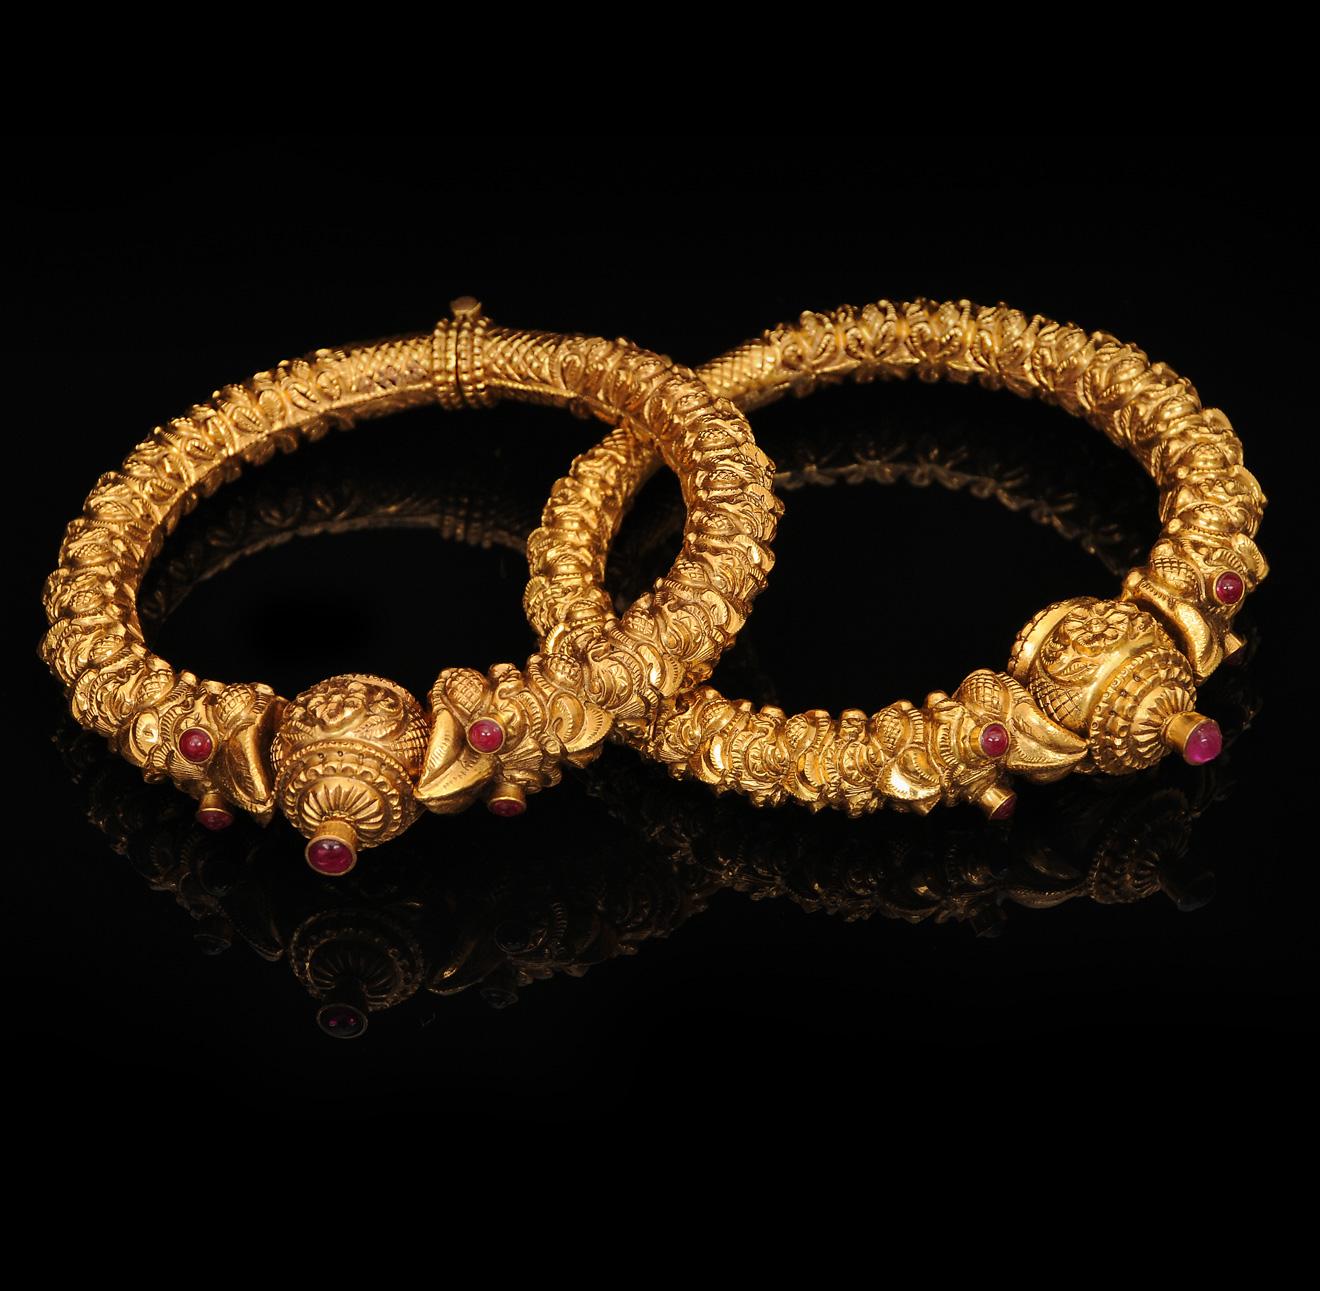 Indian Bridal Jewellery: South Indian Bridal Wedding Jewellery